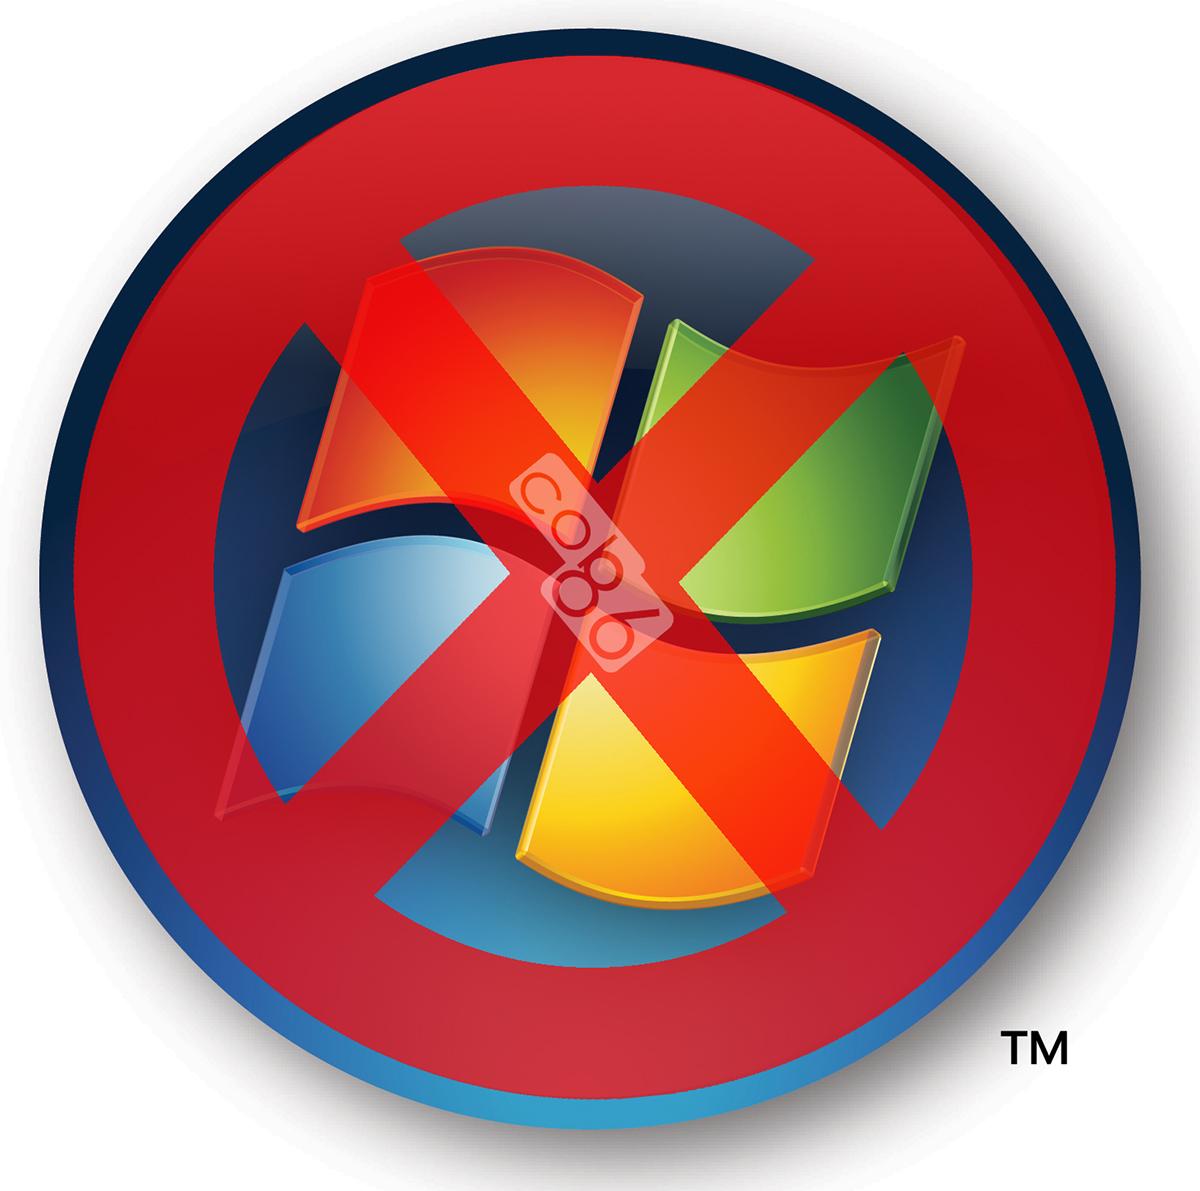 Windows_Vista_2006